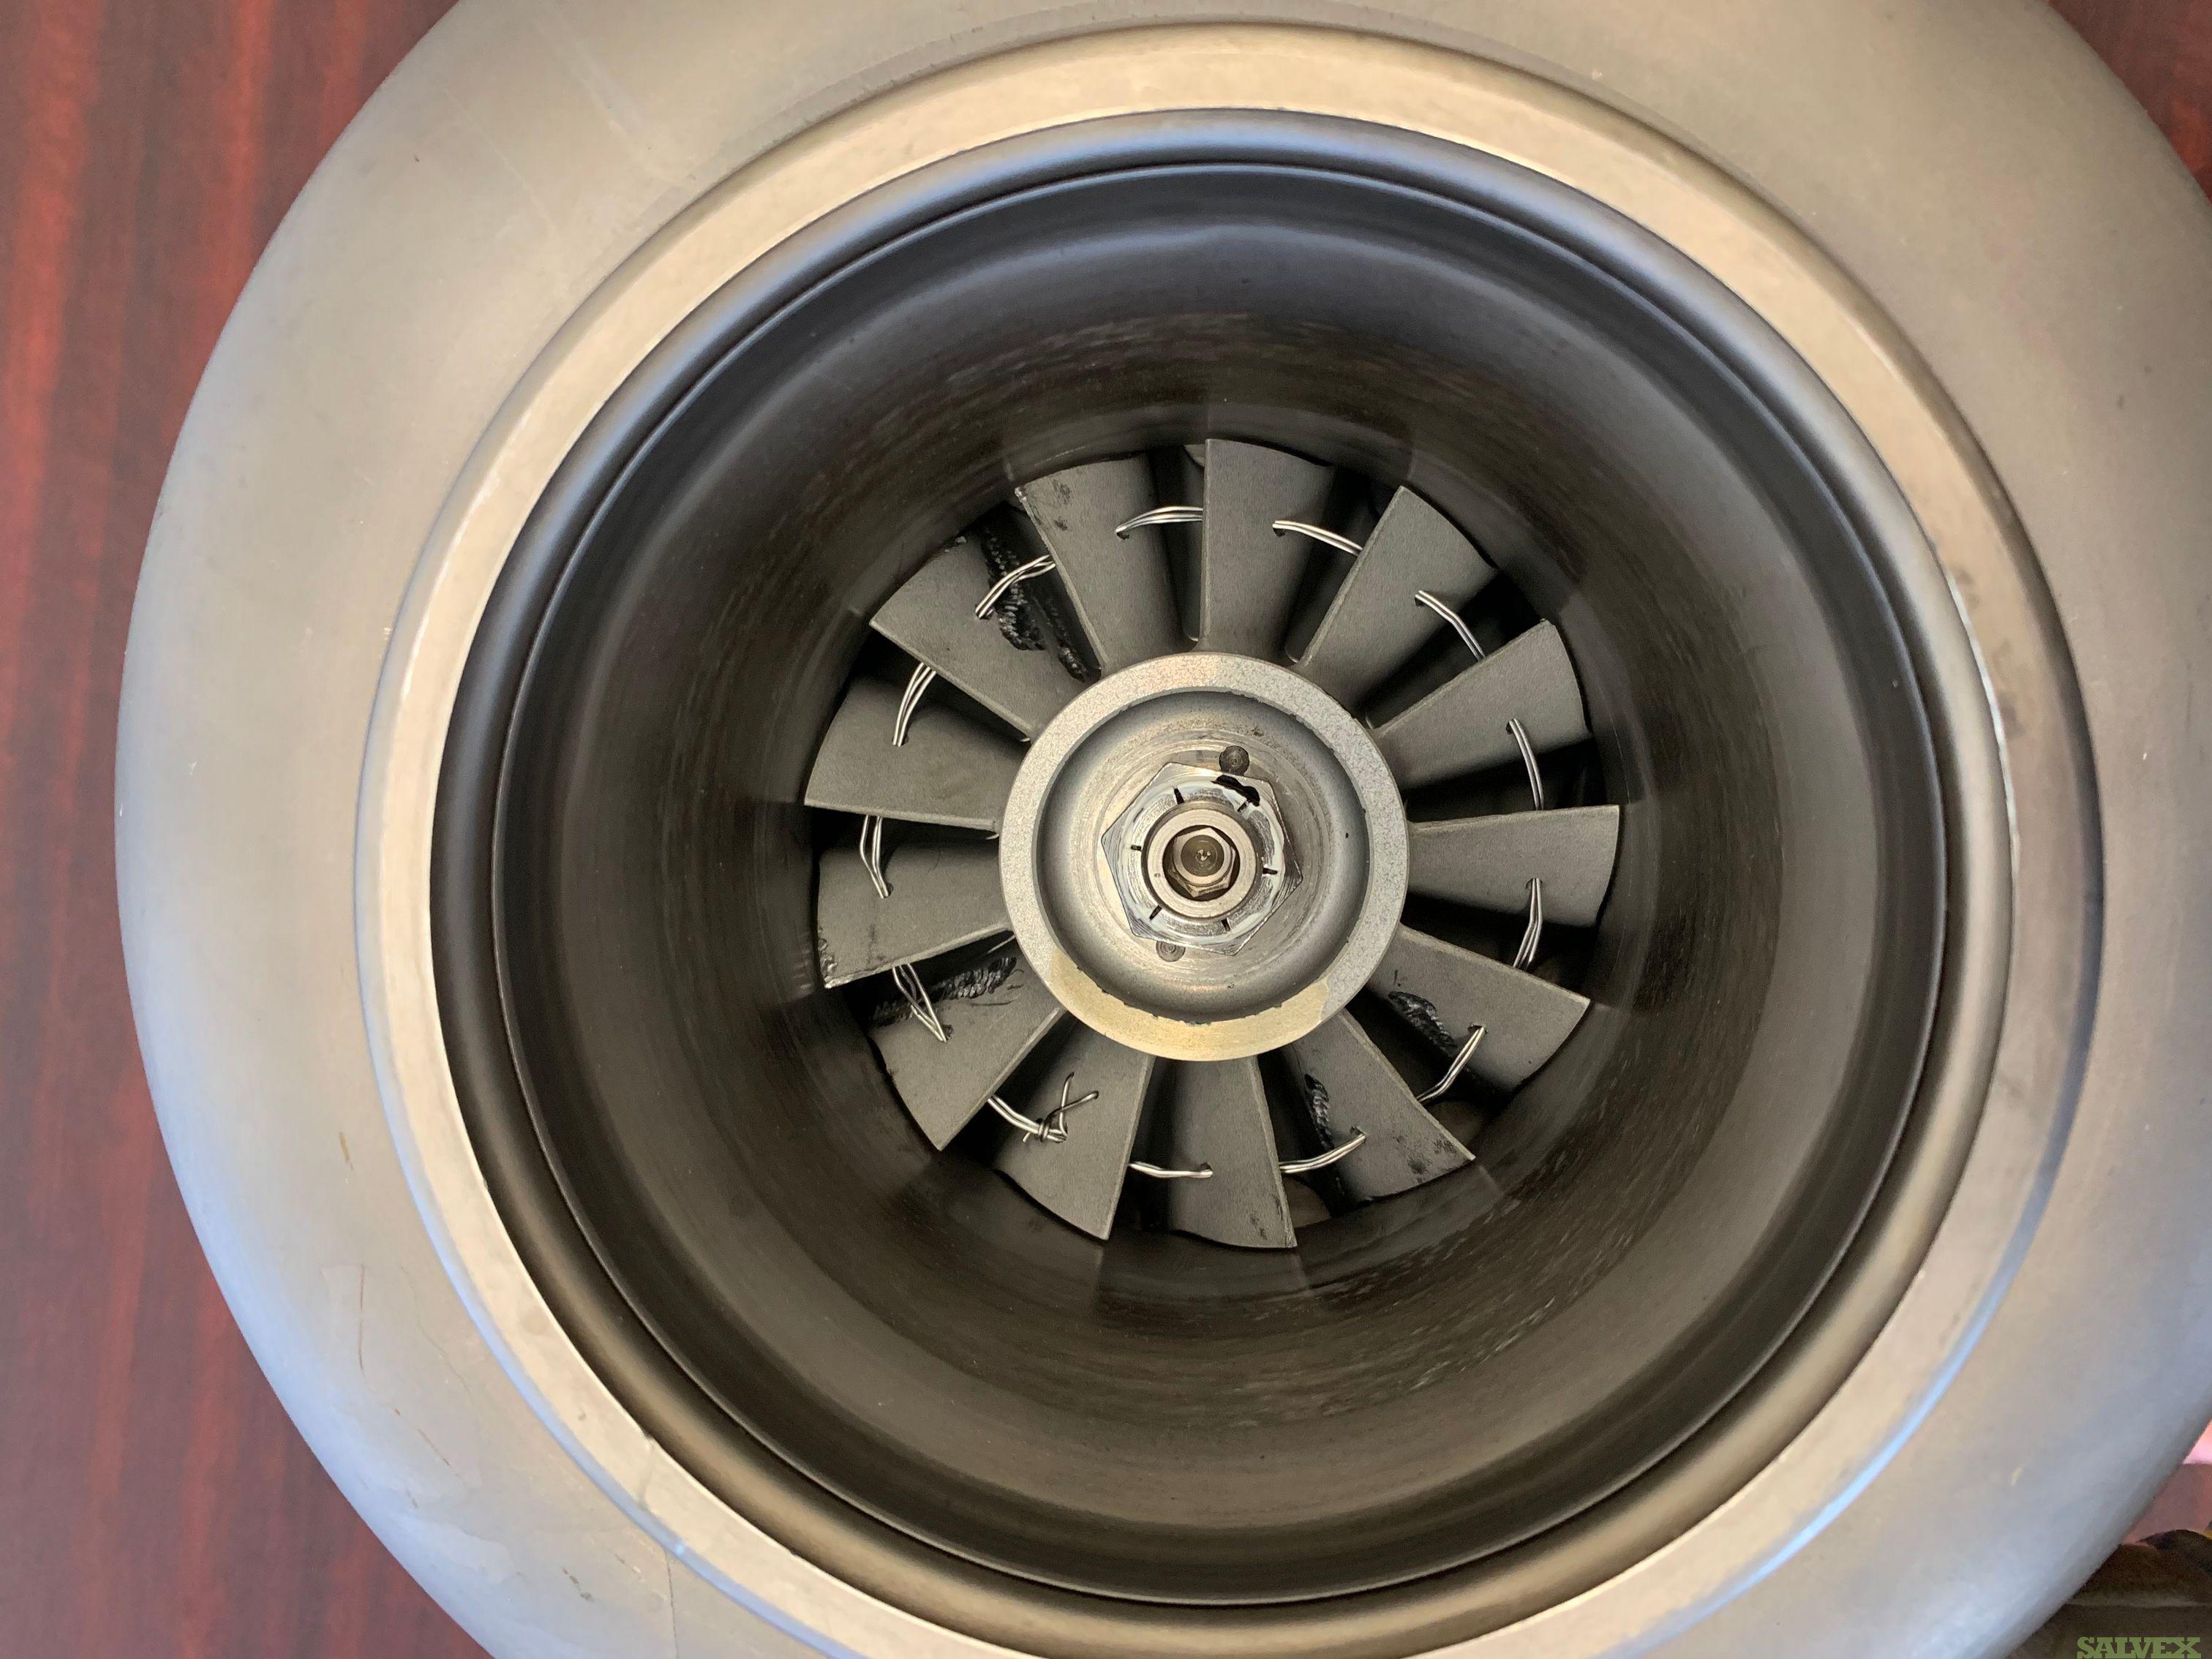 Turbine - Aircraft Cooling